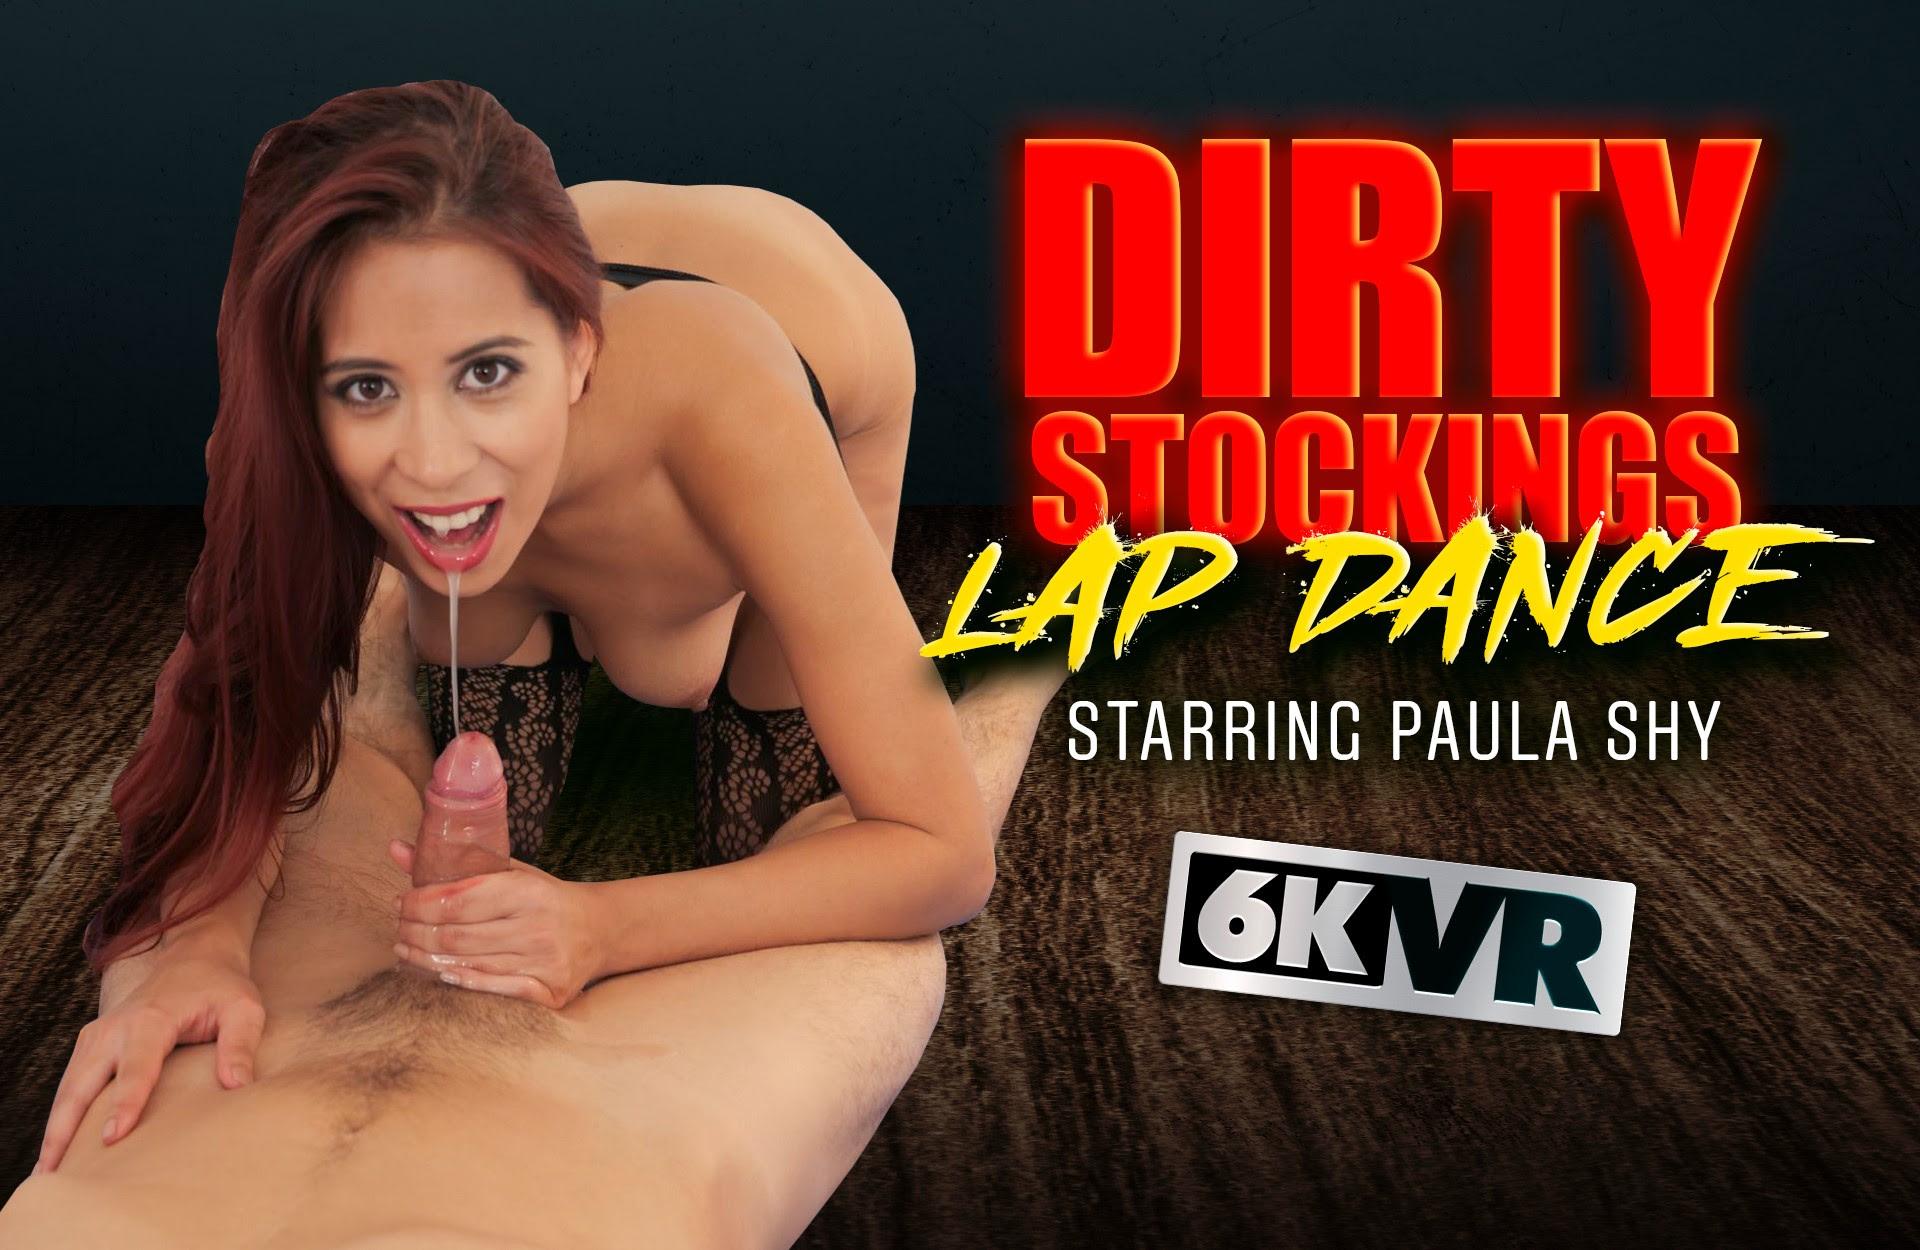 Dirty Stockings Lap Dance